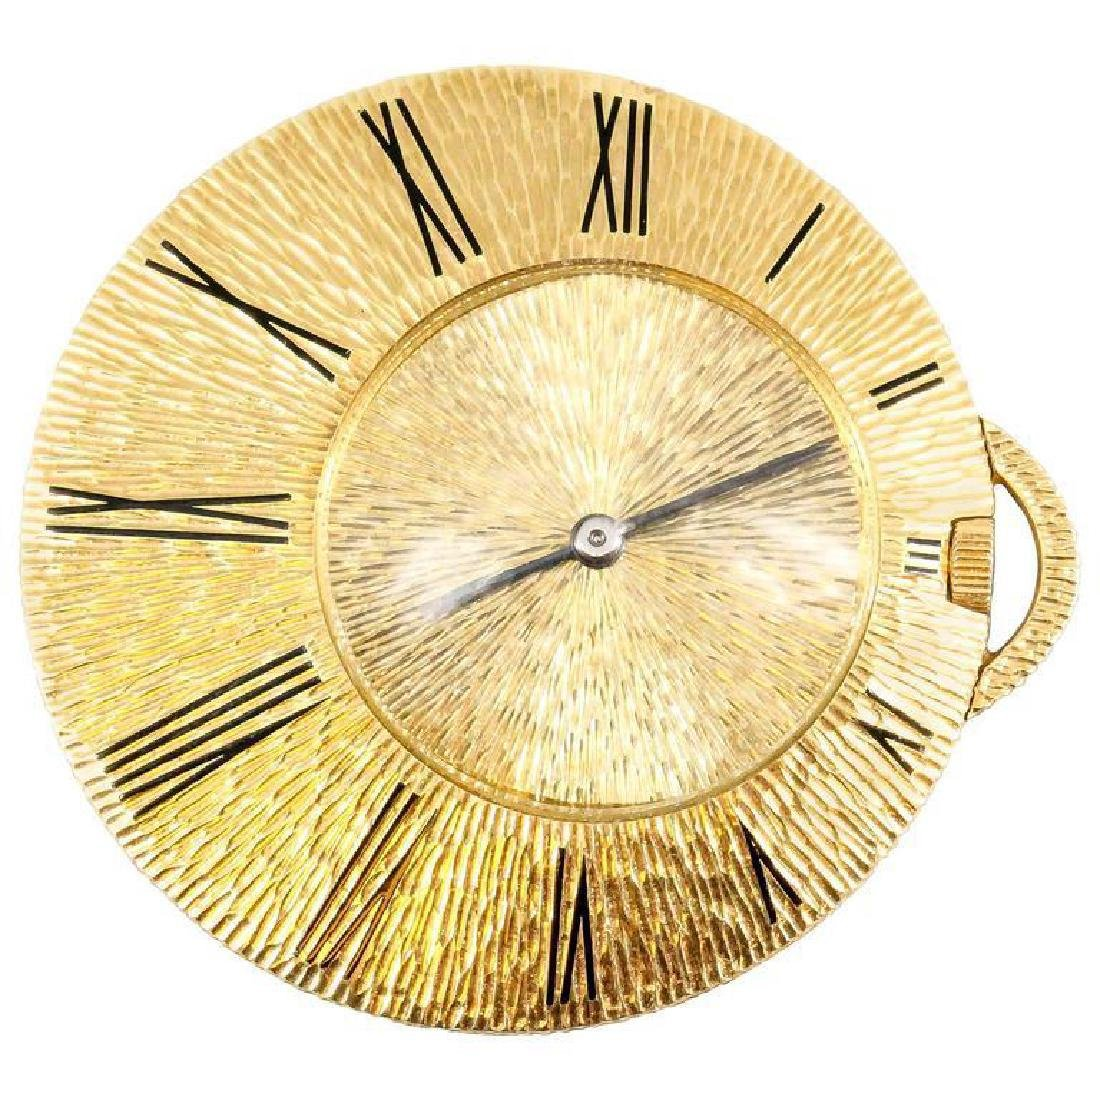 Patek Philippe Gilbert Albert Ricochet Pocket Watch